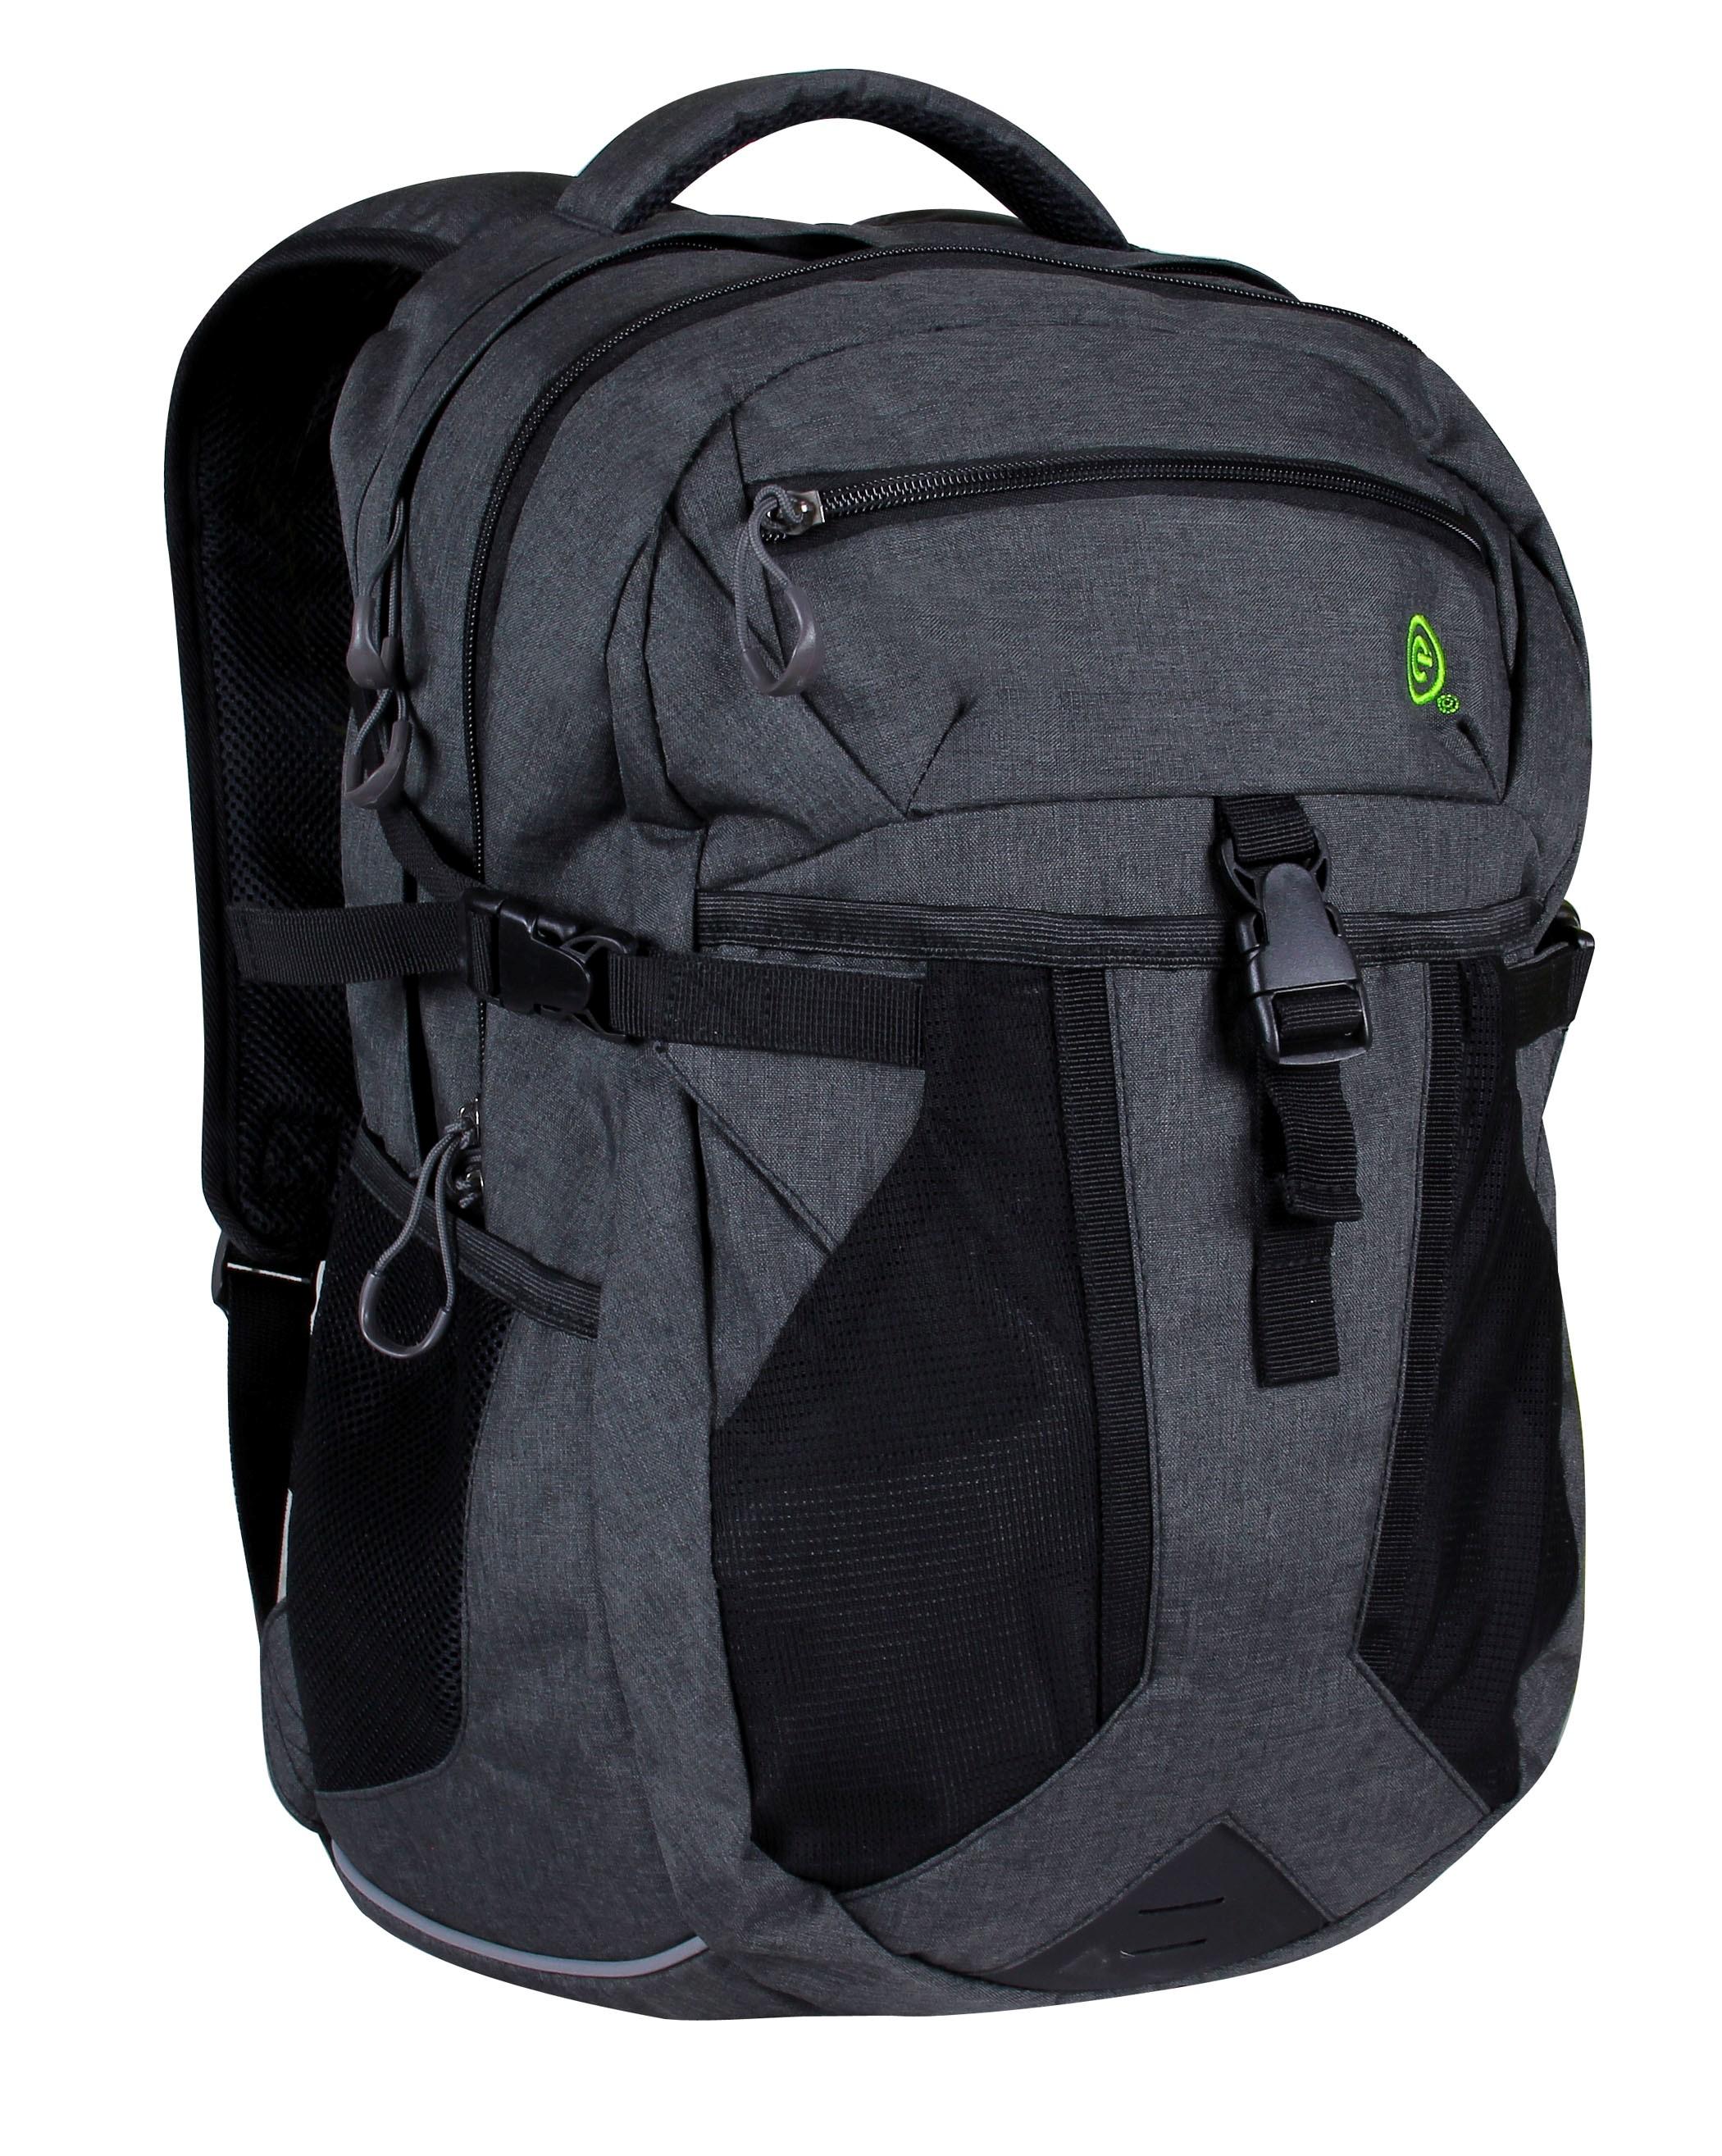 Ecogear BG-4081-ASP Bighorn Horn 17 Backpack, Asphalt